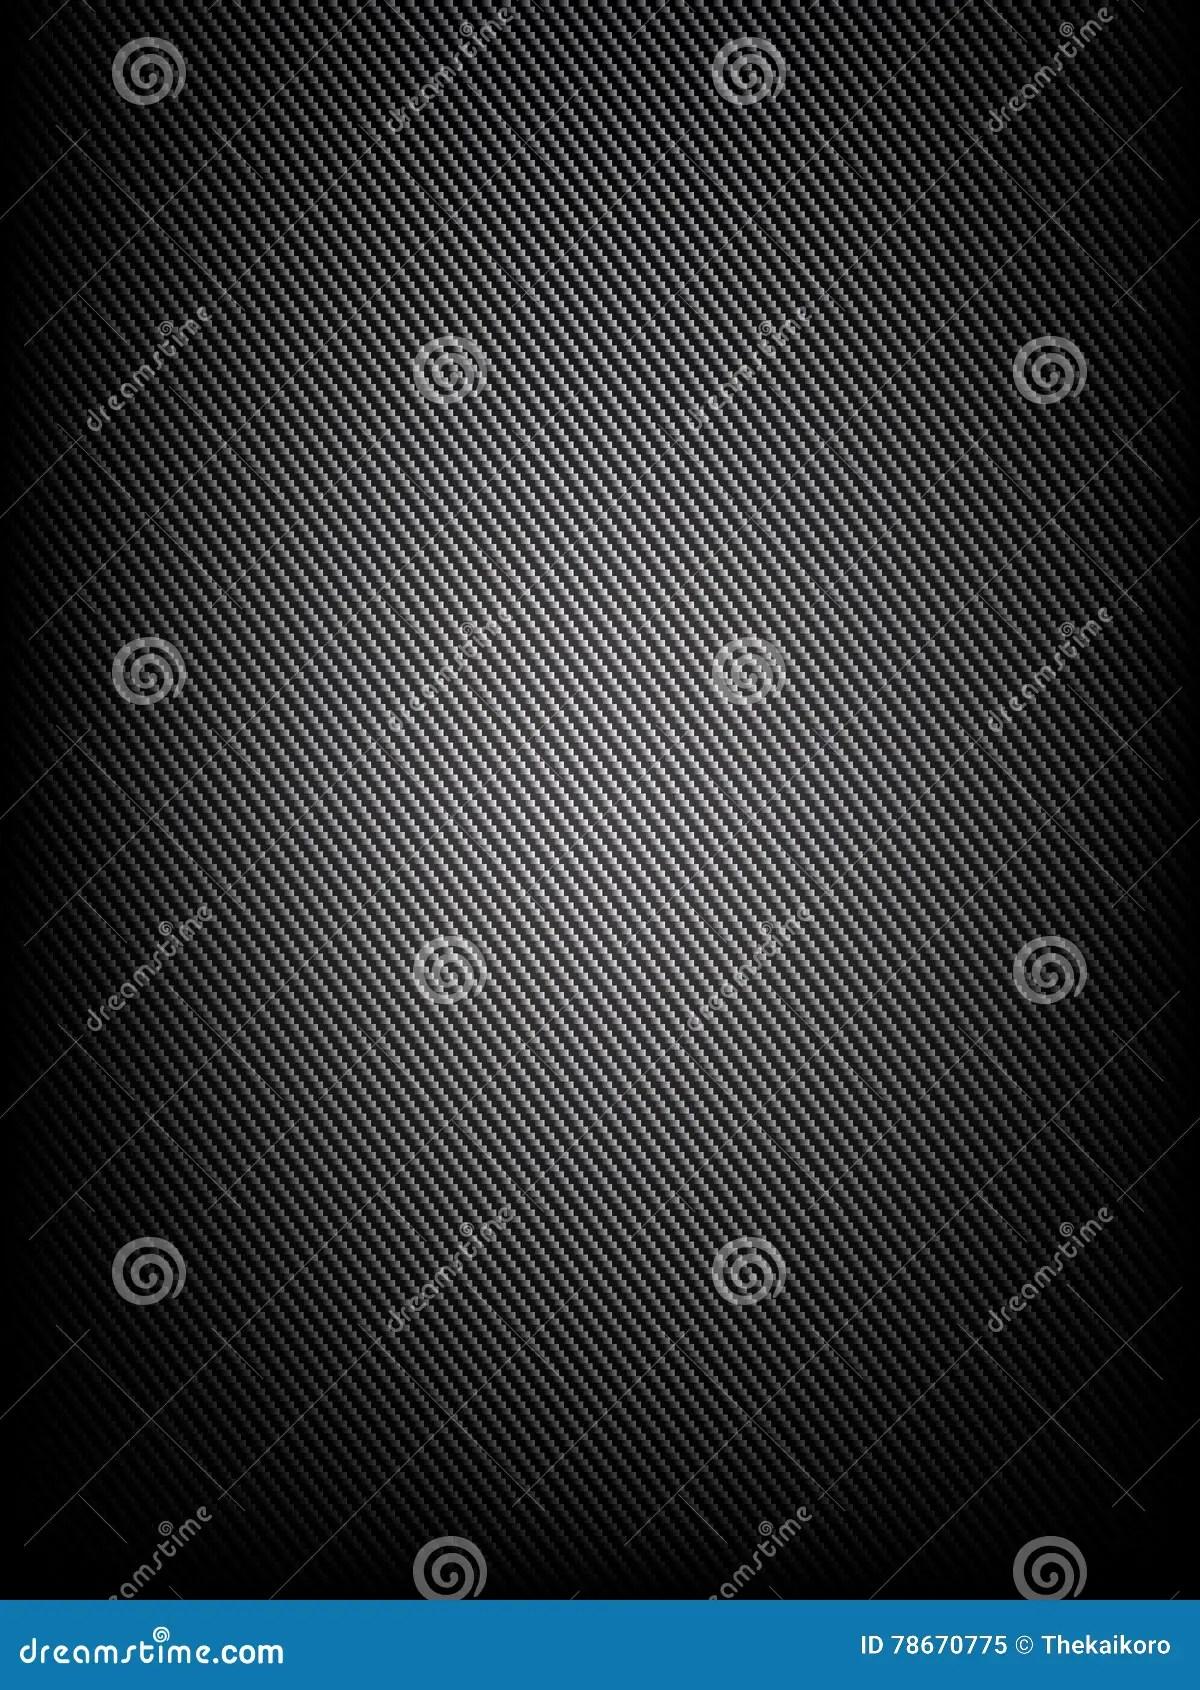 Abstract Background Dark And Black Carbon Fiber Vector Illustration